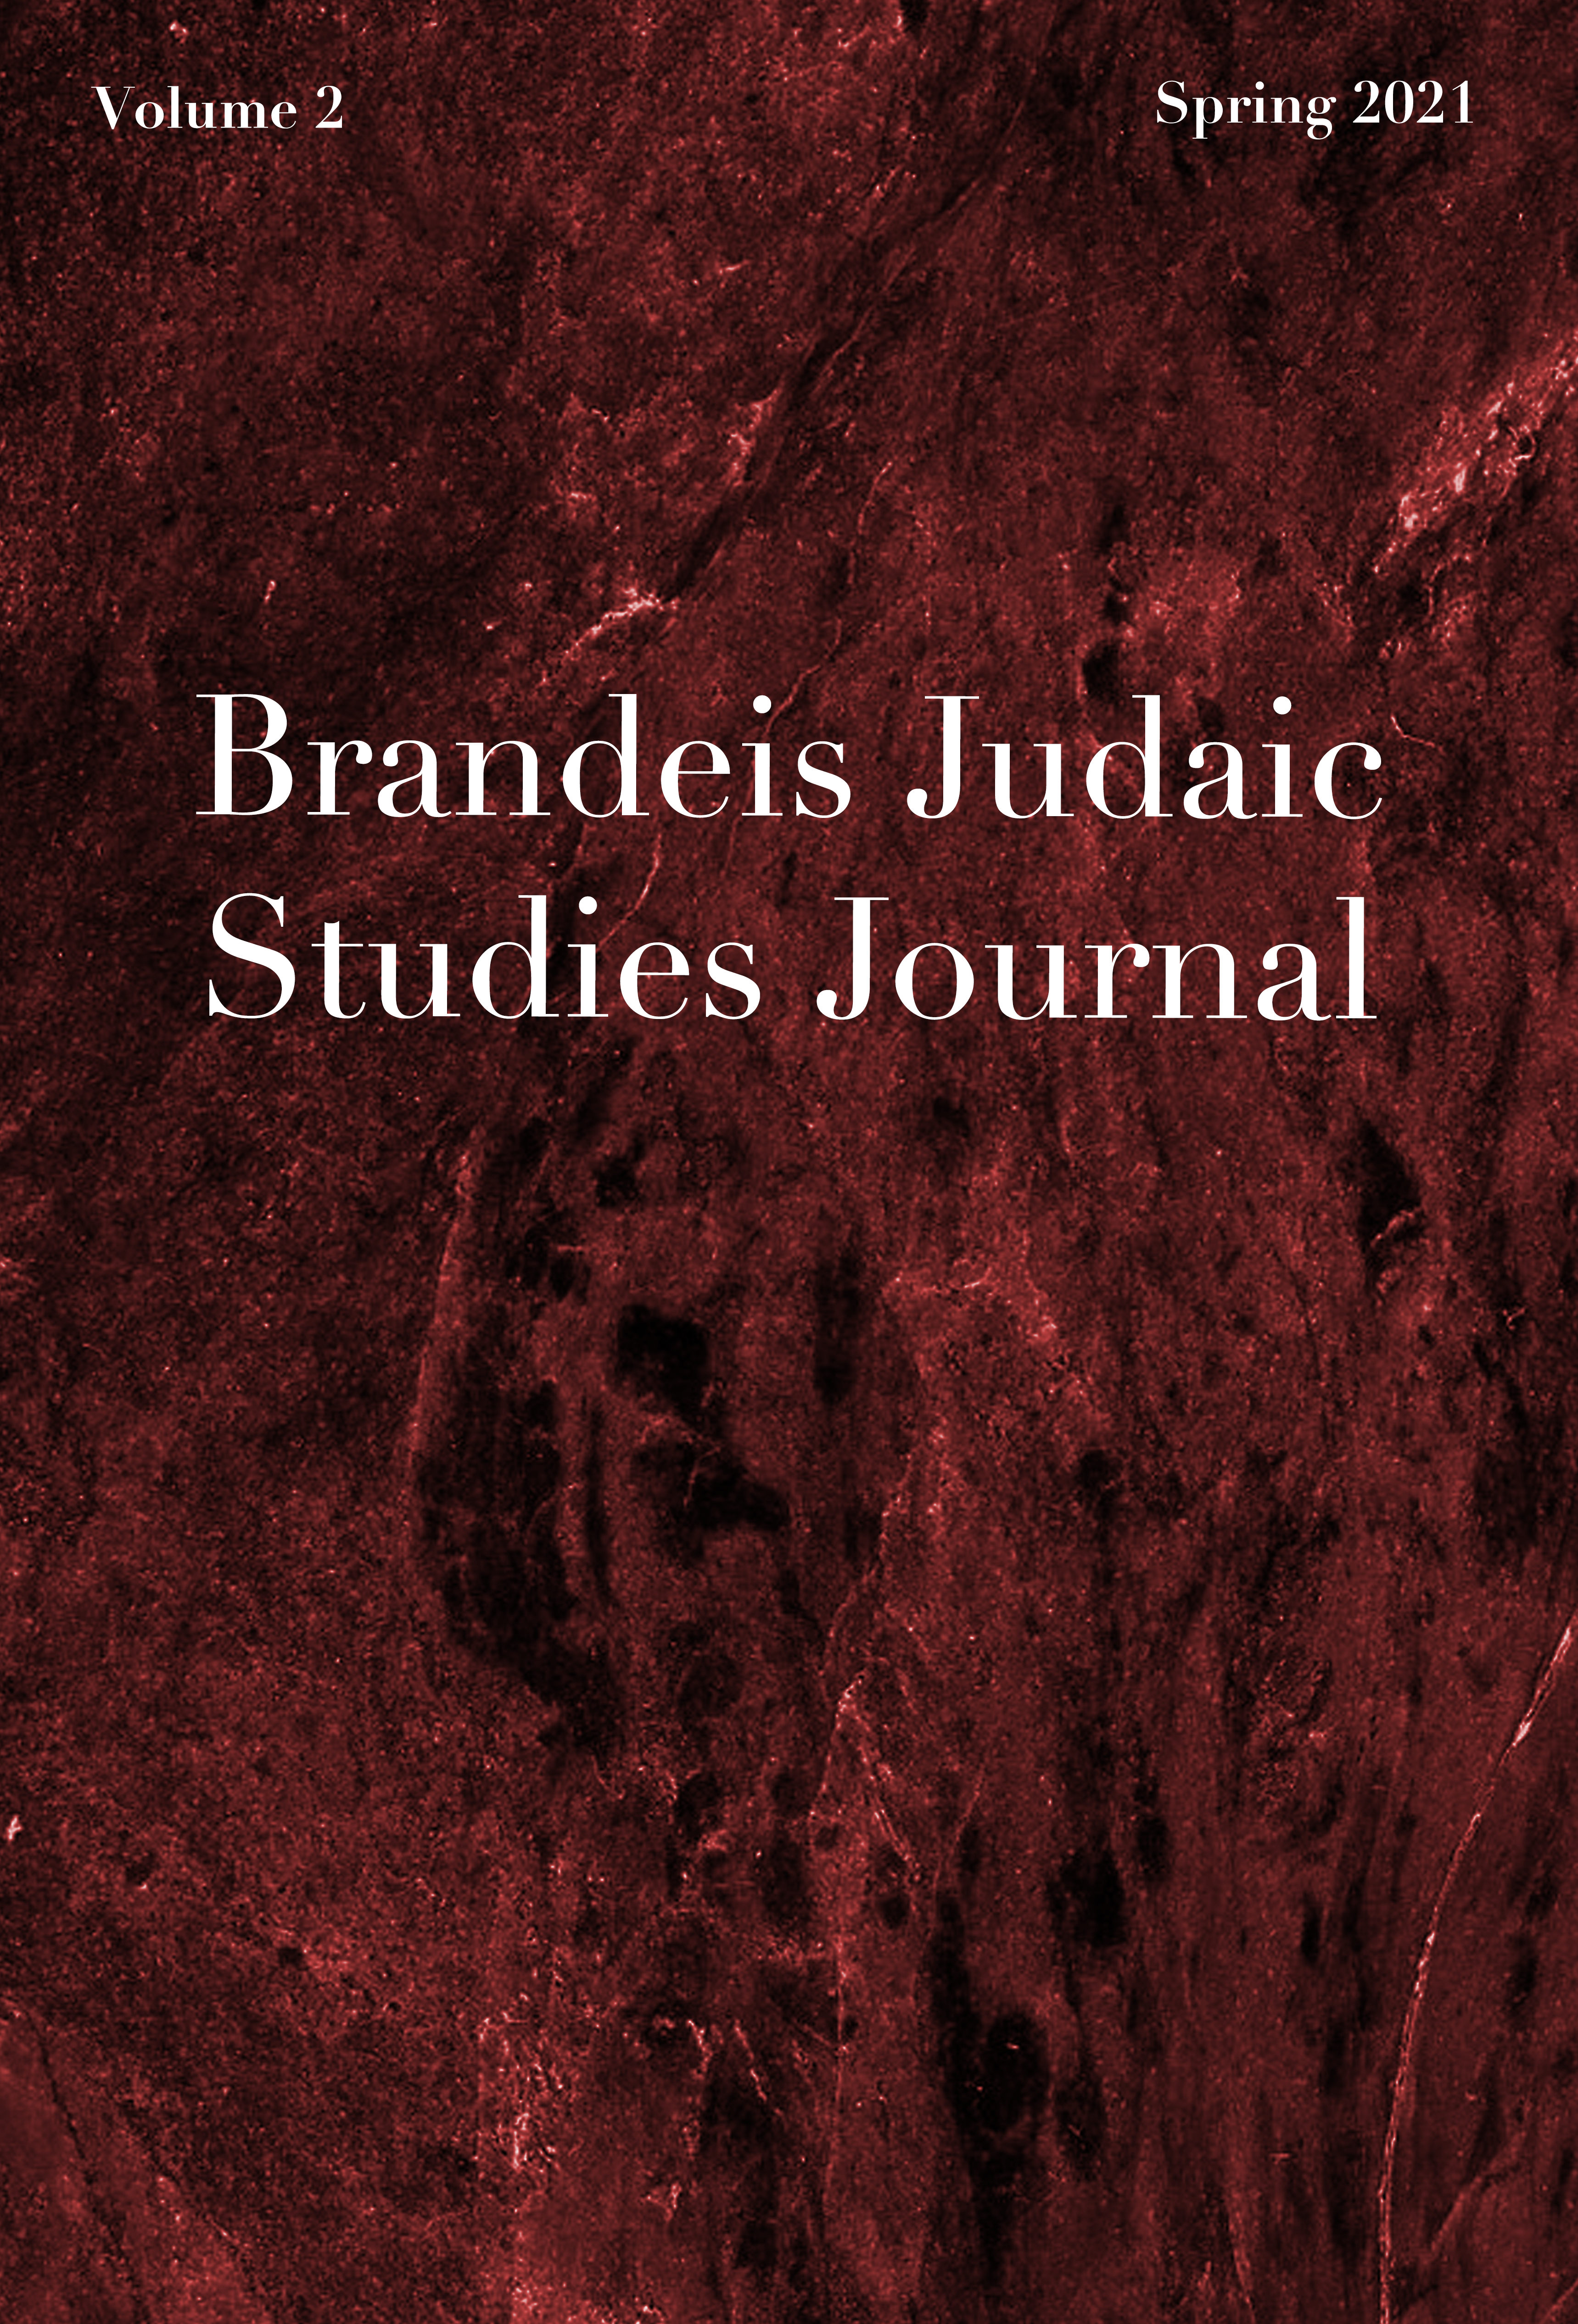 Brandeis Judaic Studies Journal (Volume 2)